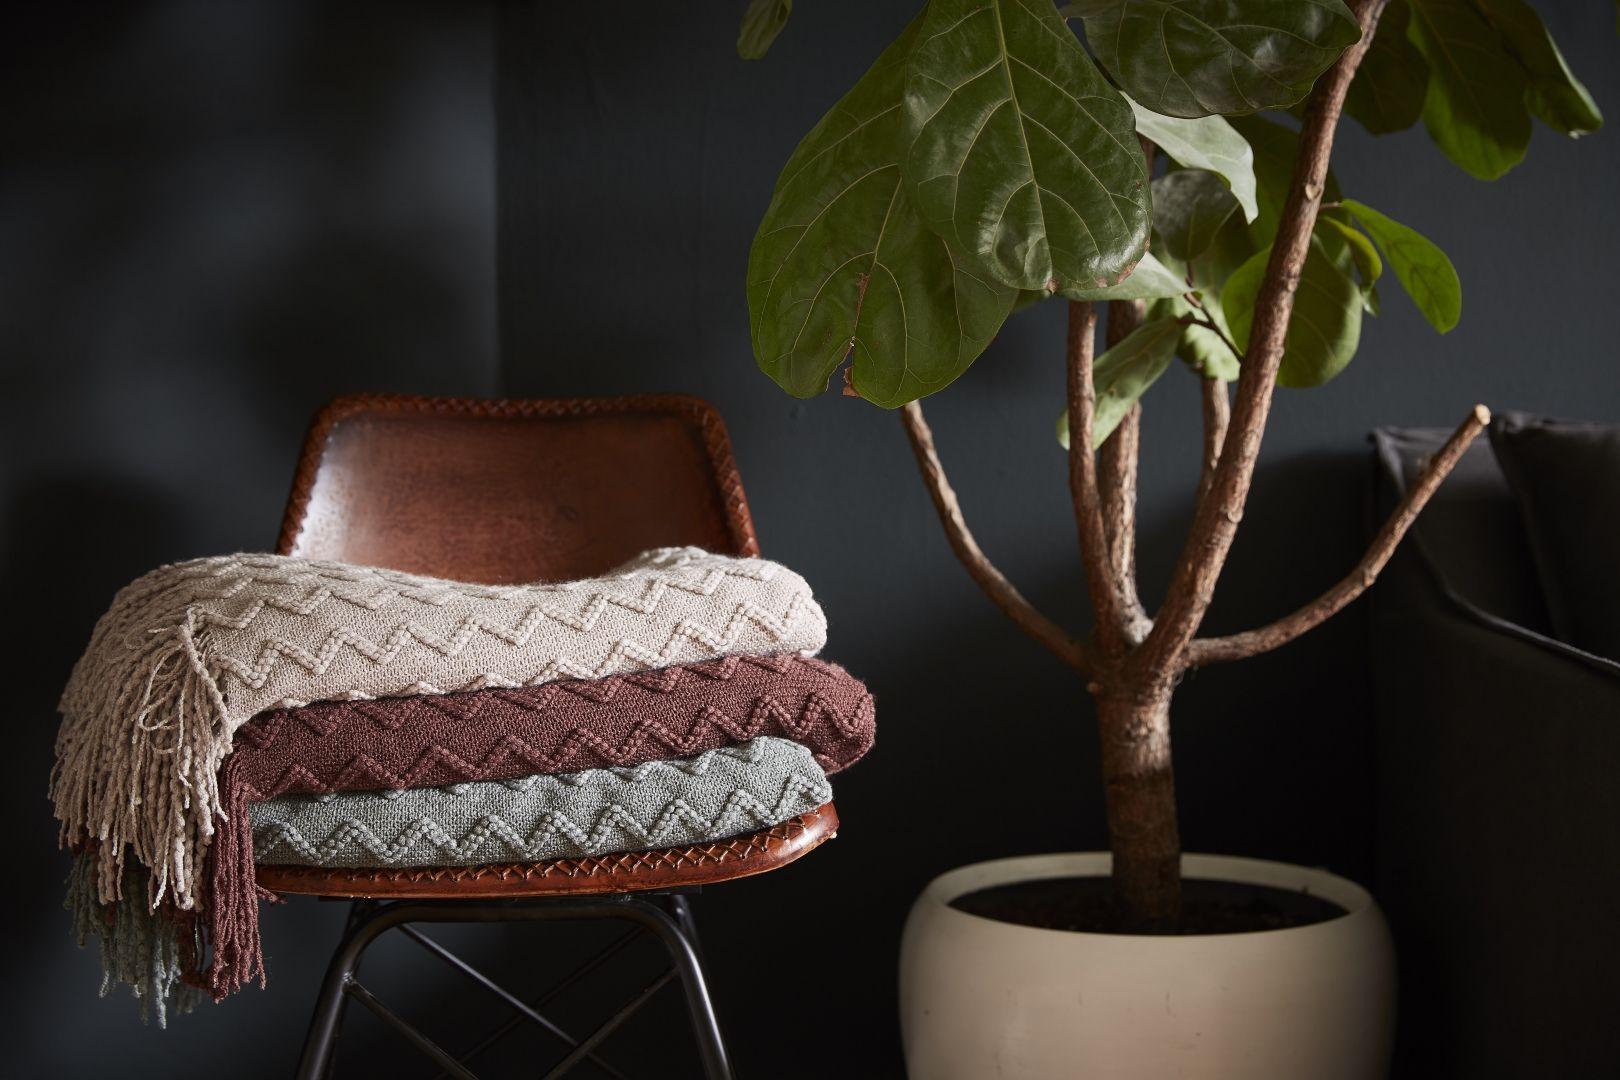 Woontrends winter trends showroom and interiors